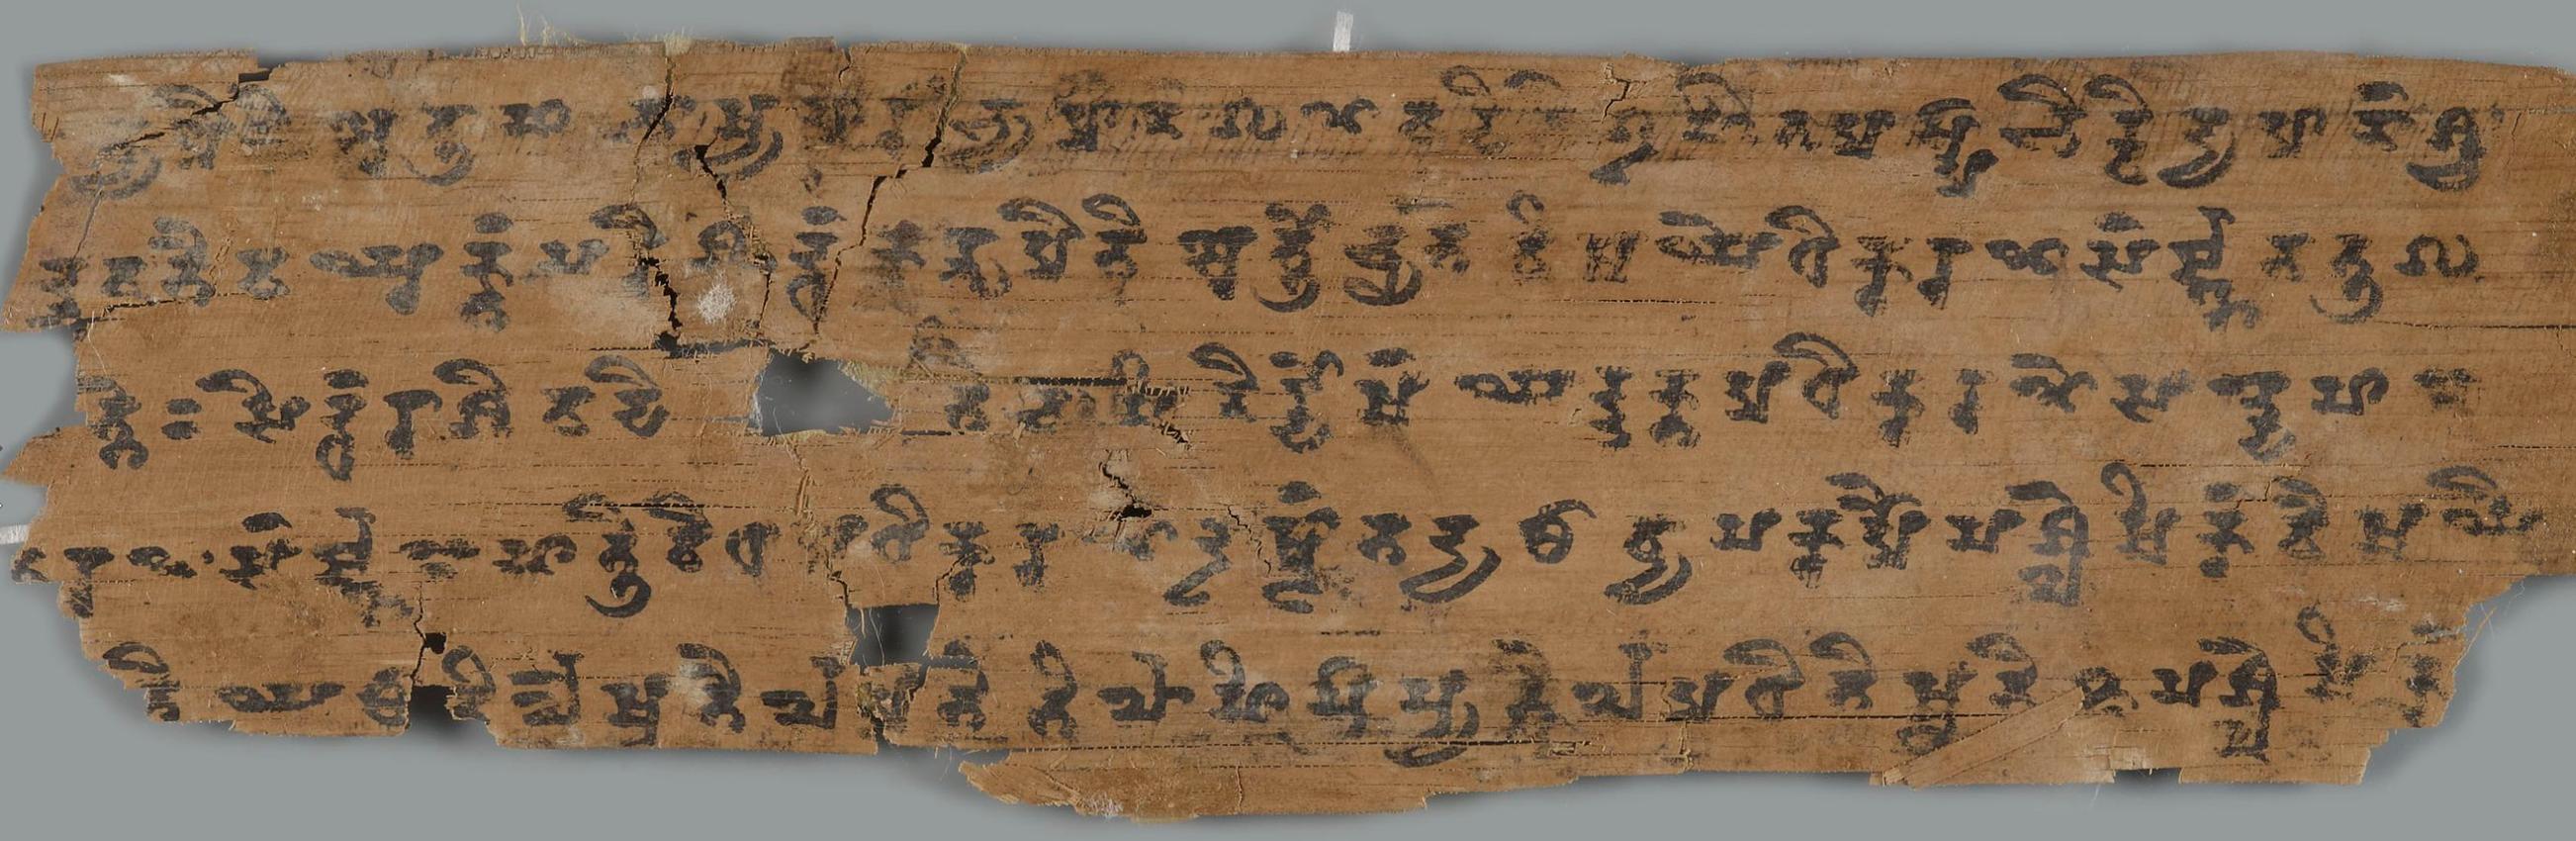 Sanskrit has very less Dravidian words, whereas Tamil has